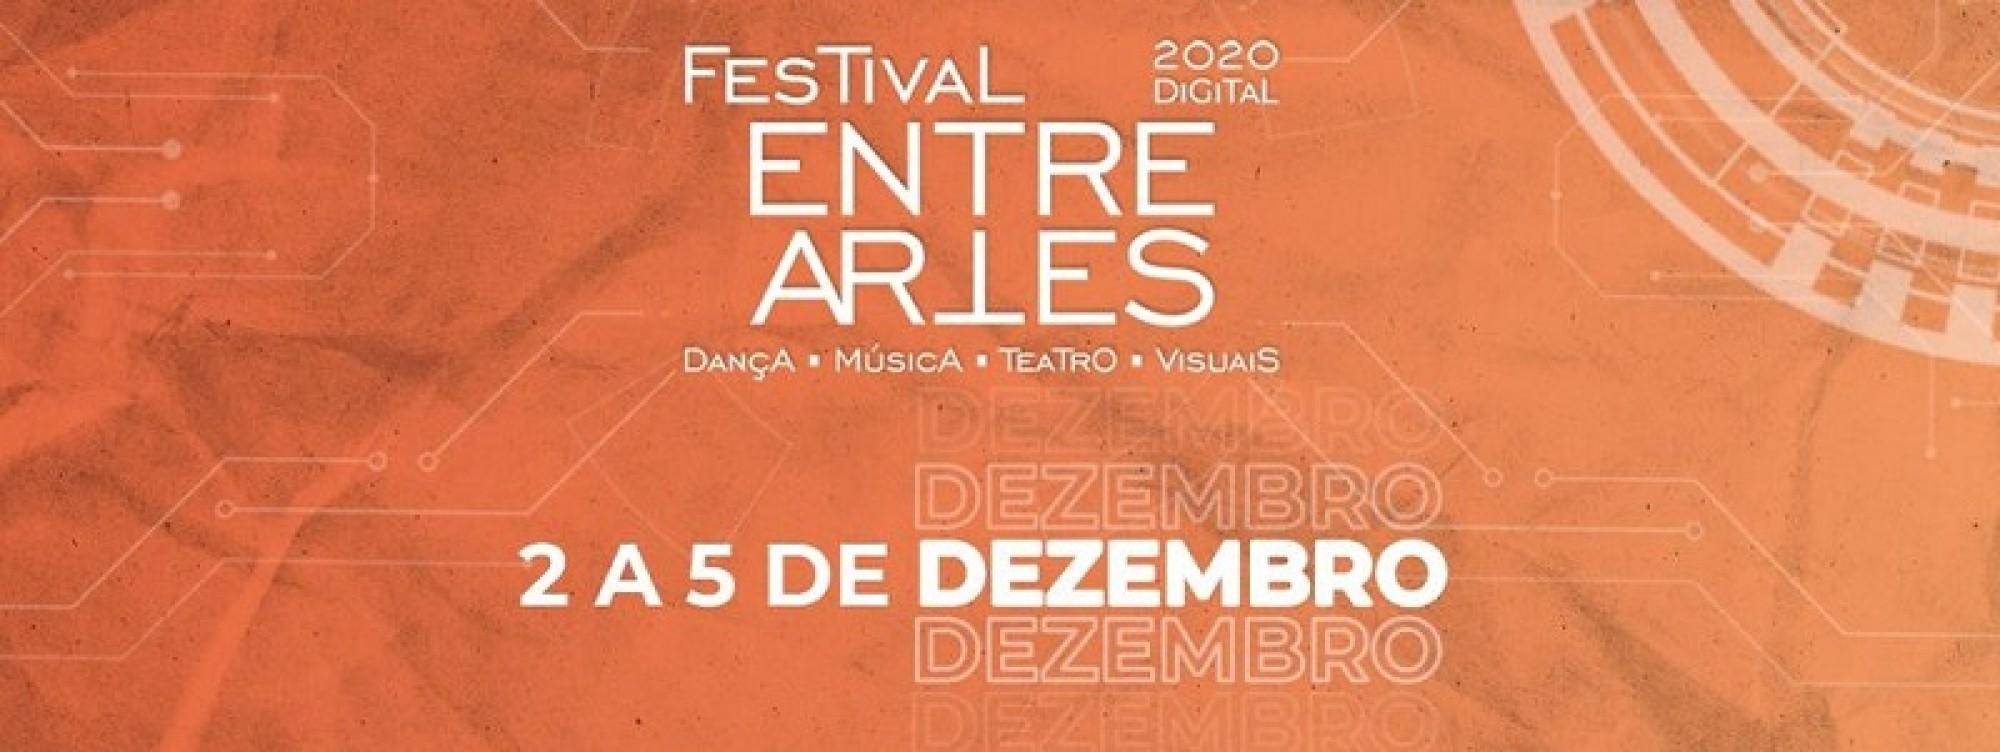 ADUFU-SS apoia Festival EntreArtes